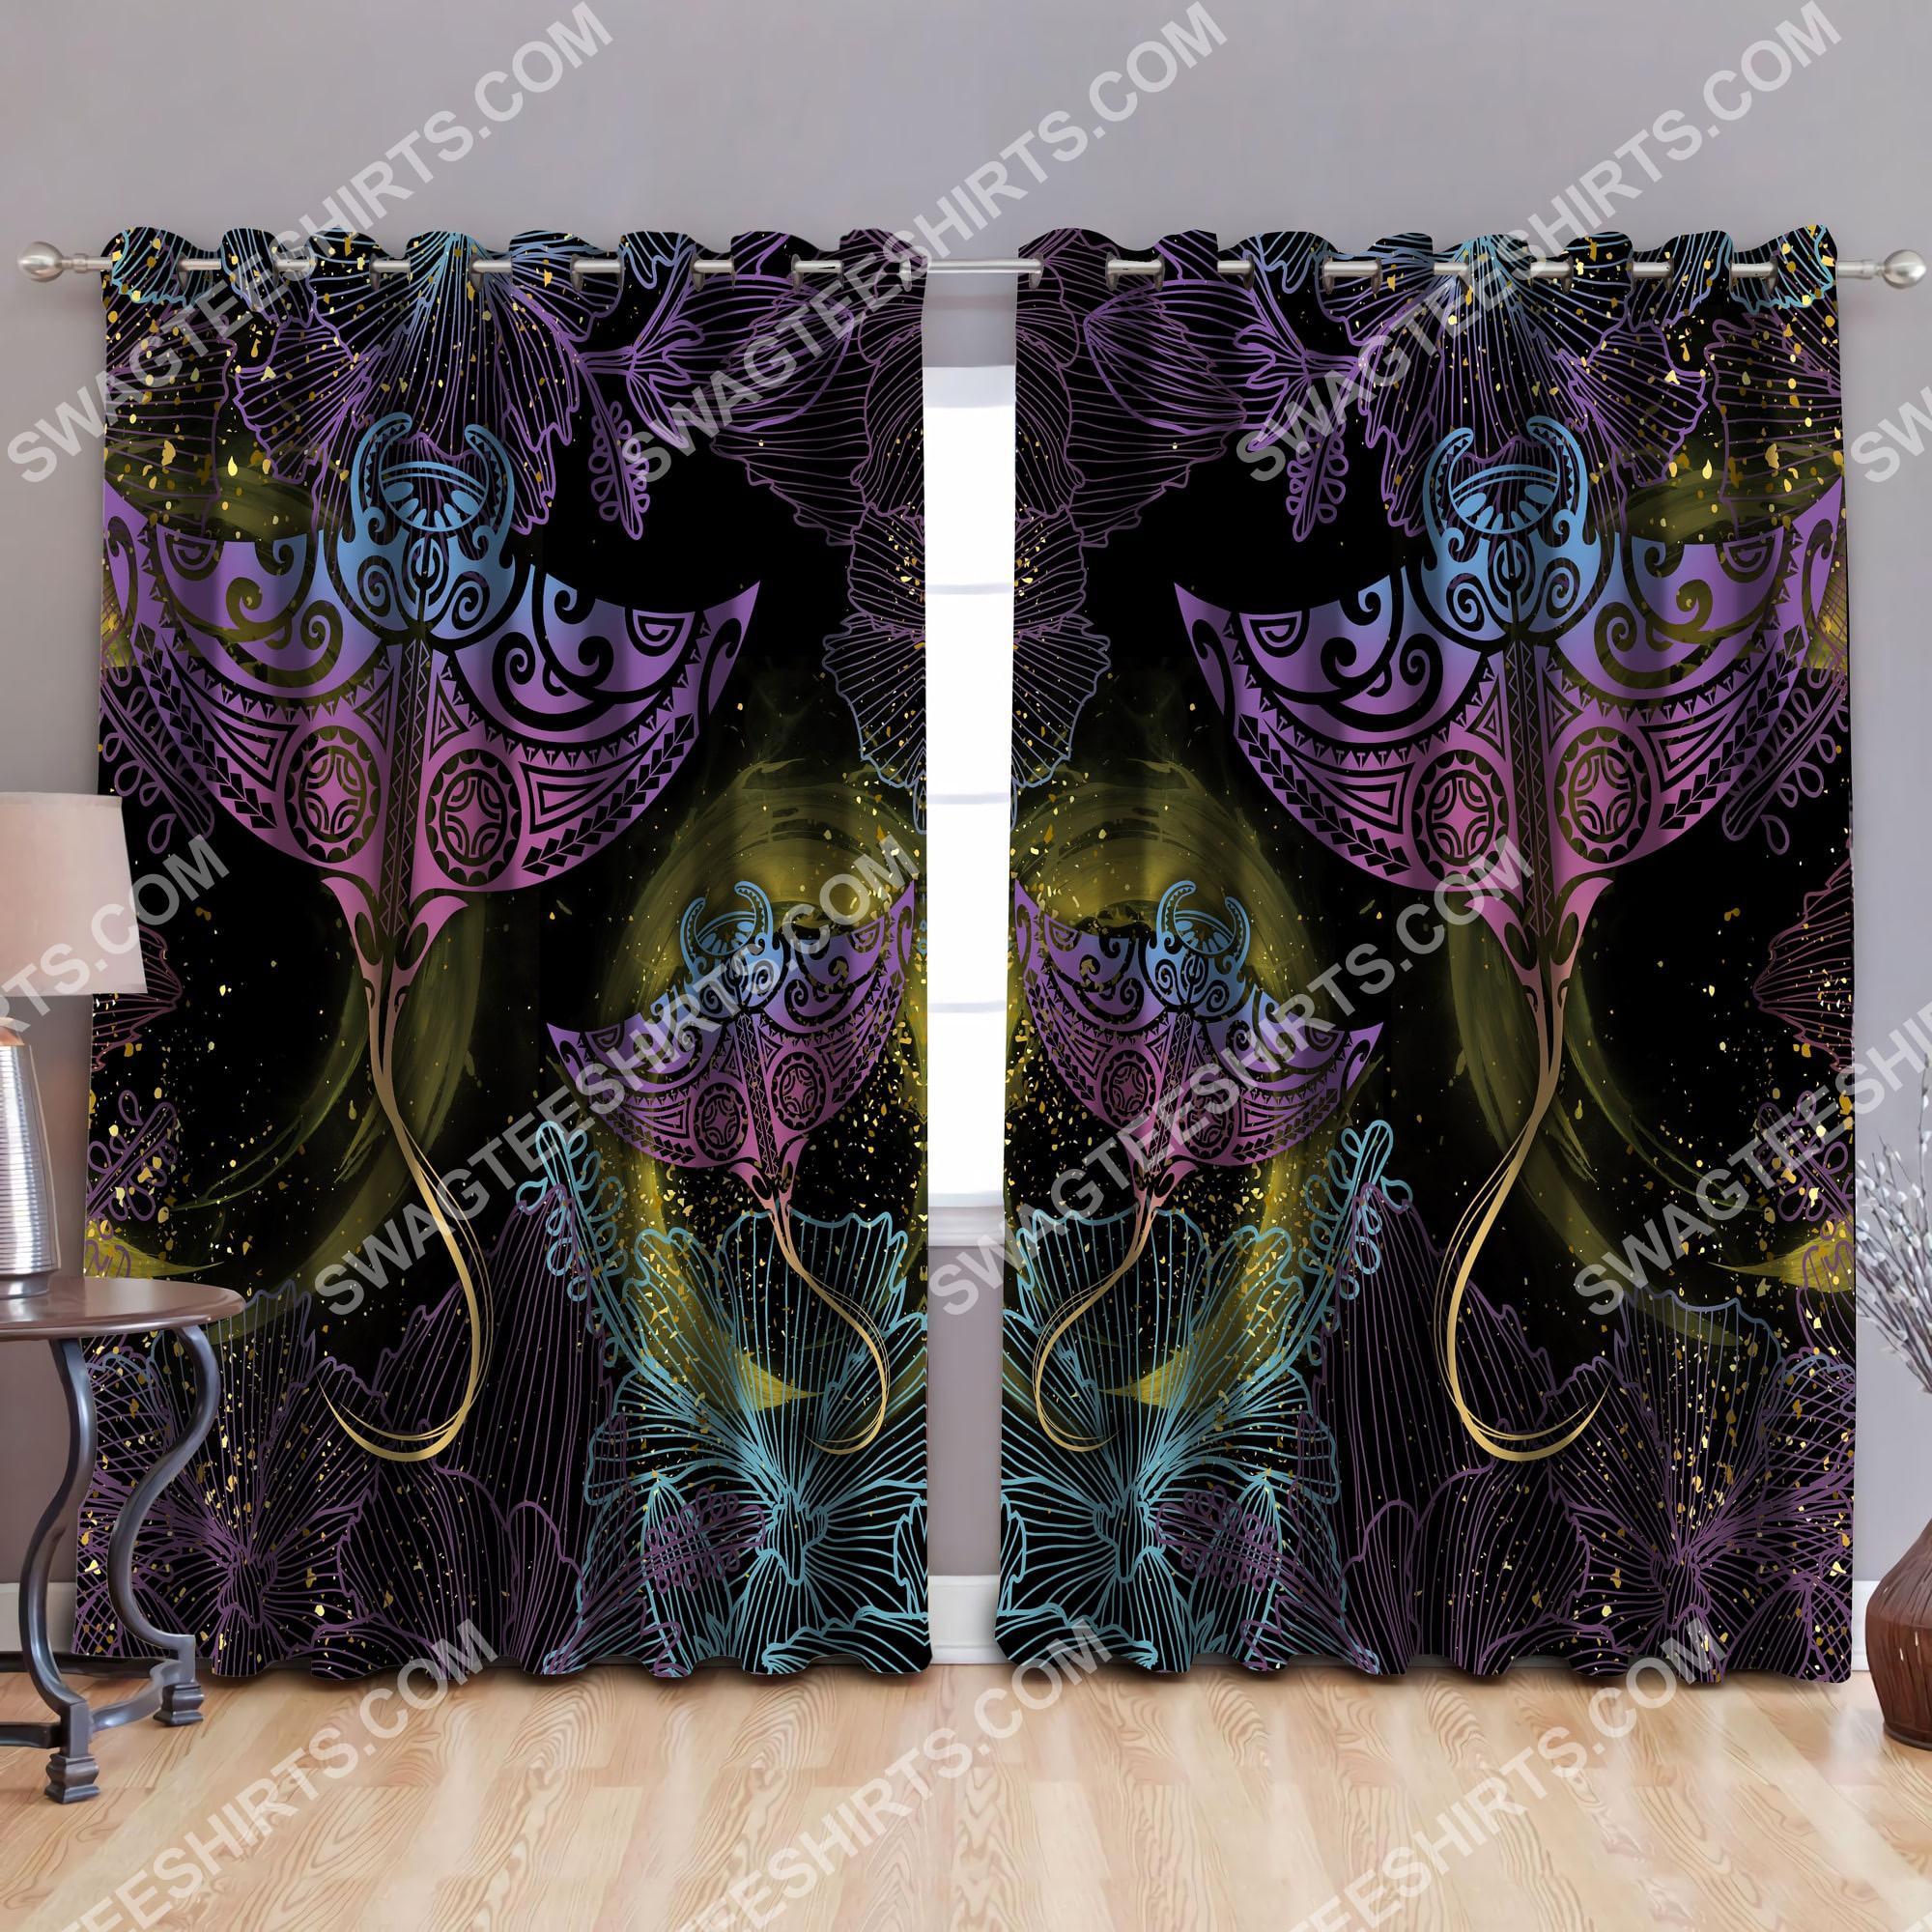 polynesian beautiful ray galaxy all over printed window curtains 2(3) - Copy